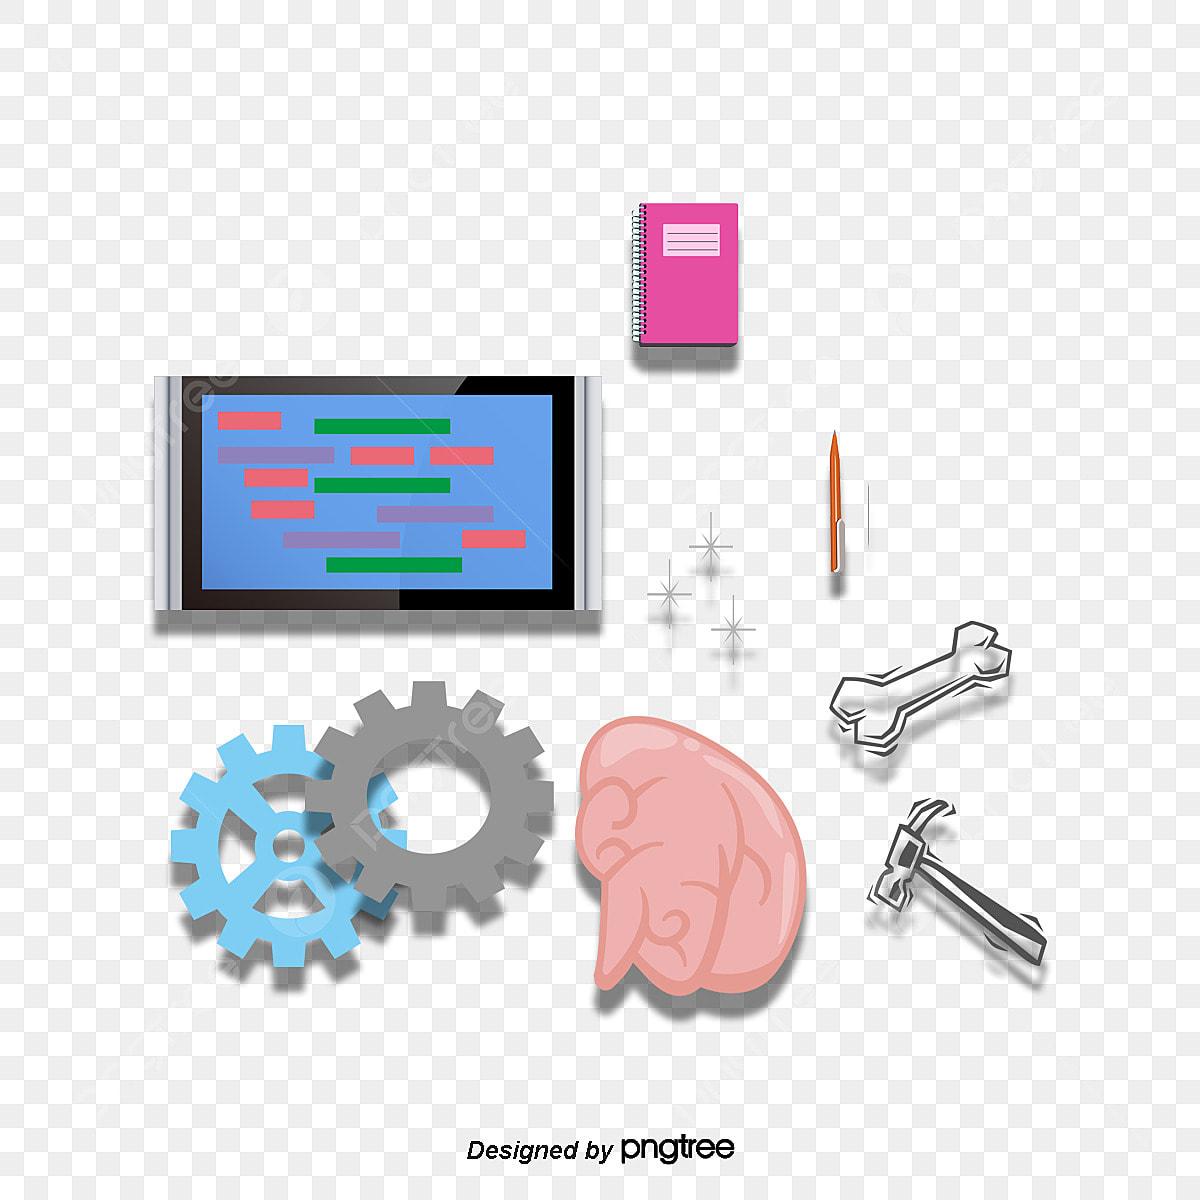 Application server Application software Clip art - App Cliparts png  herunterladen - 648*800 - Kostenlos transparent Technologie png  Herunterladen.